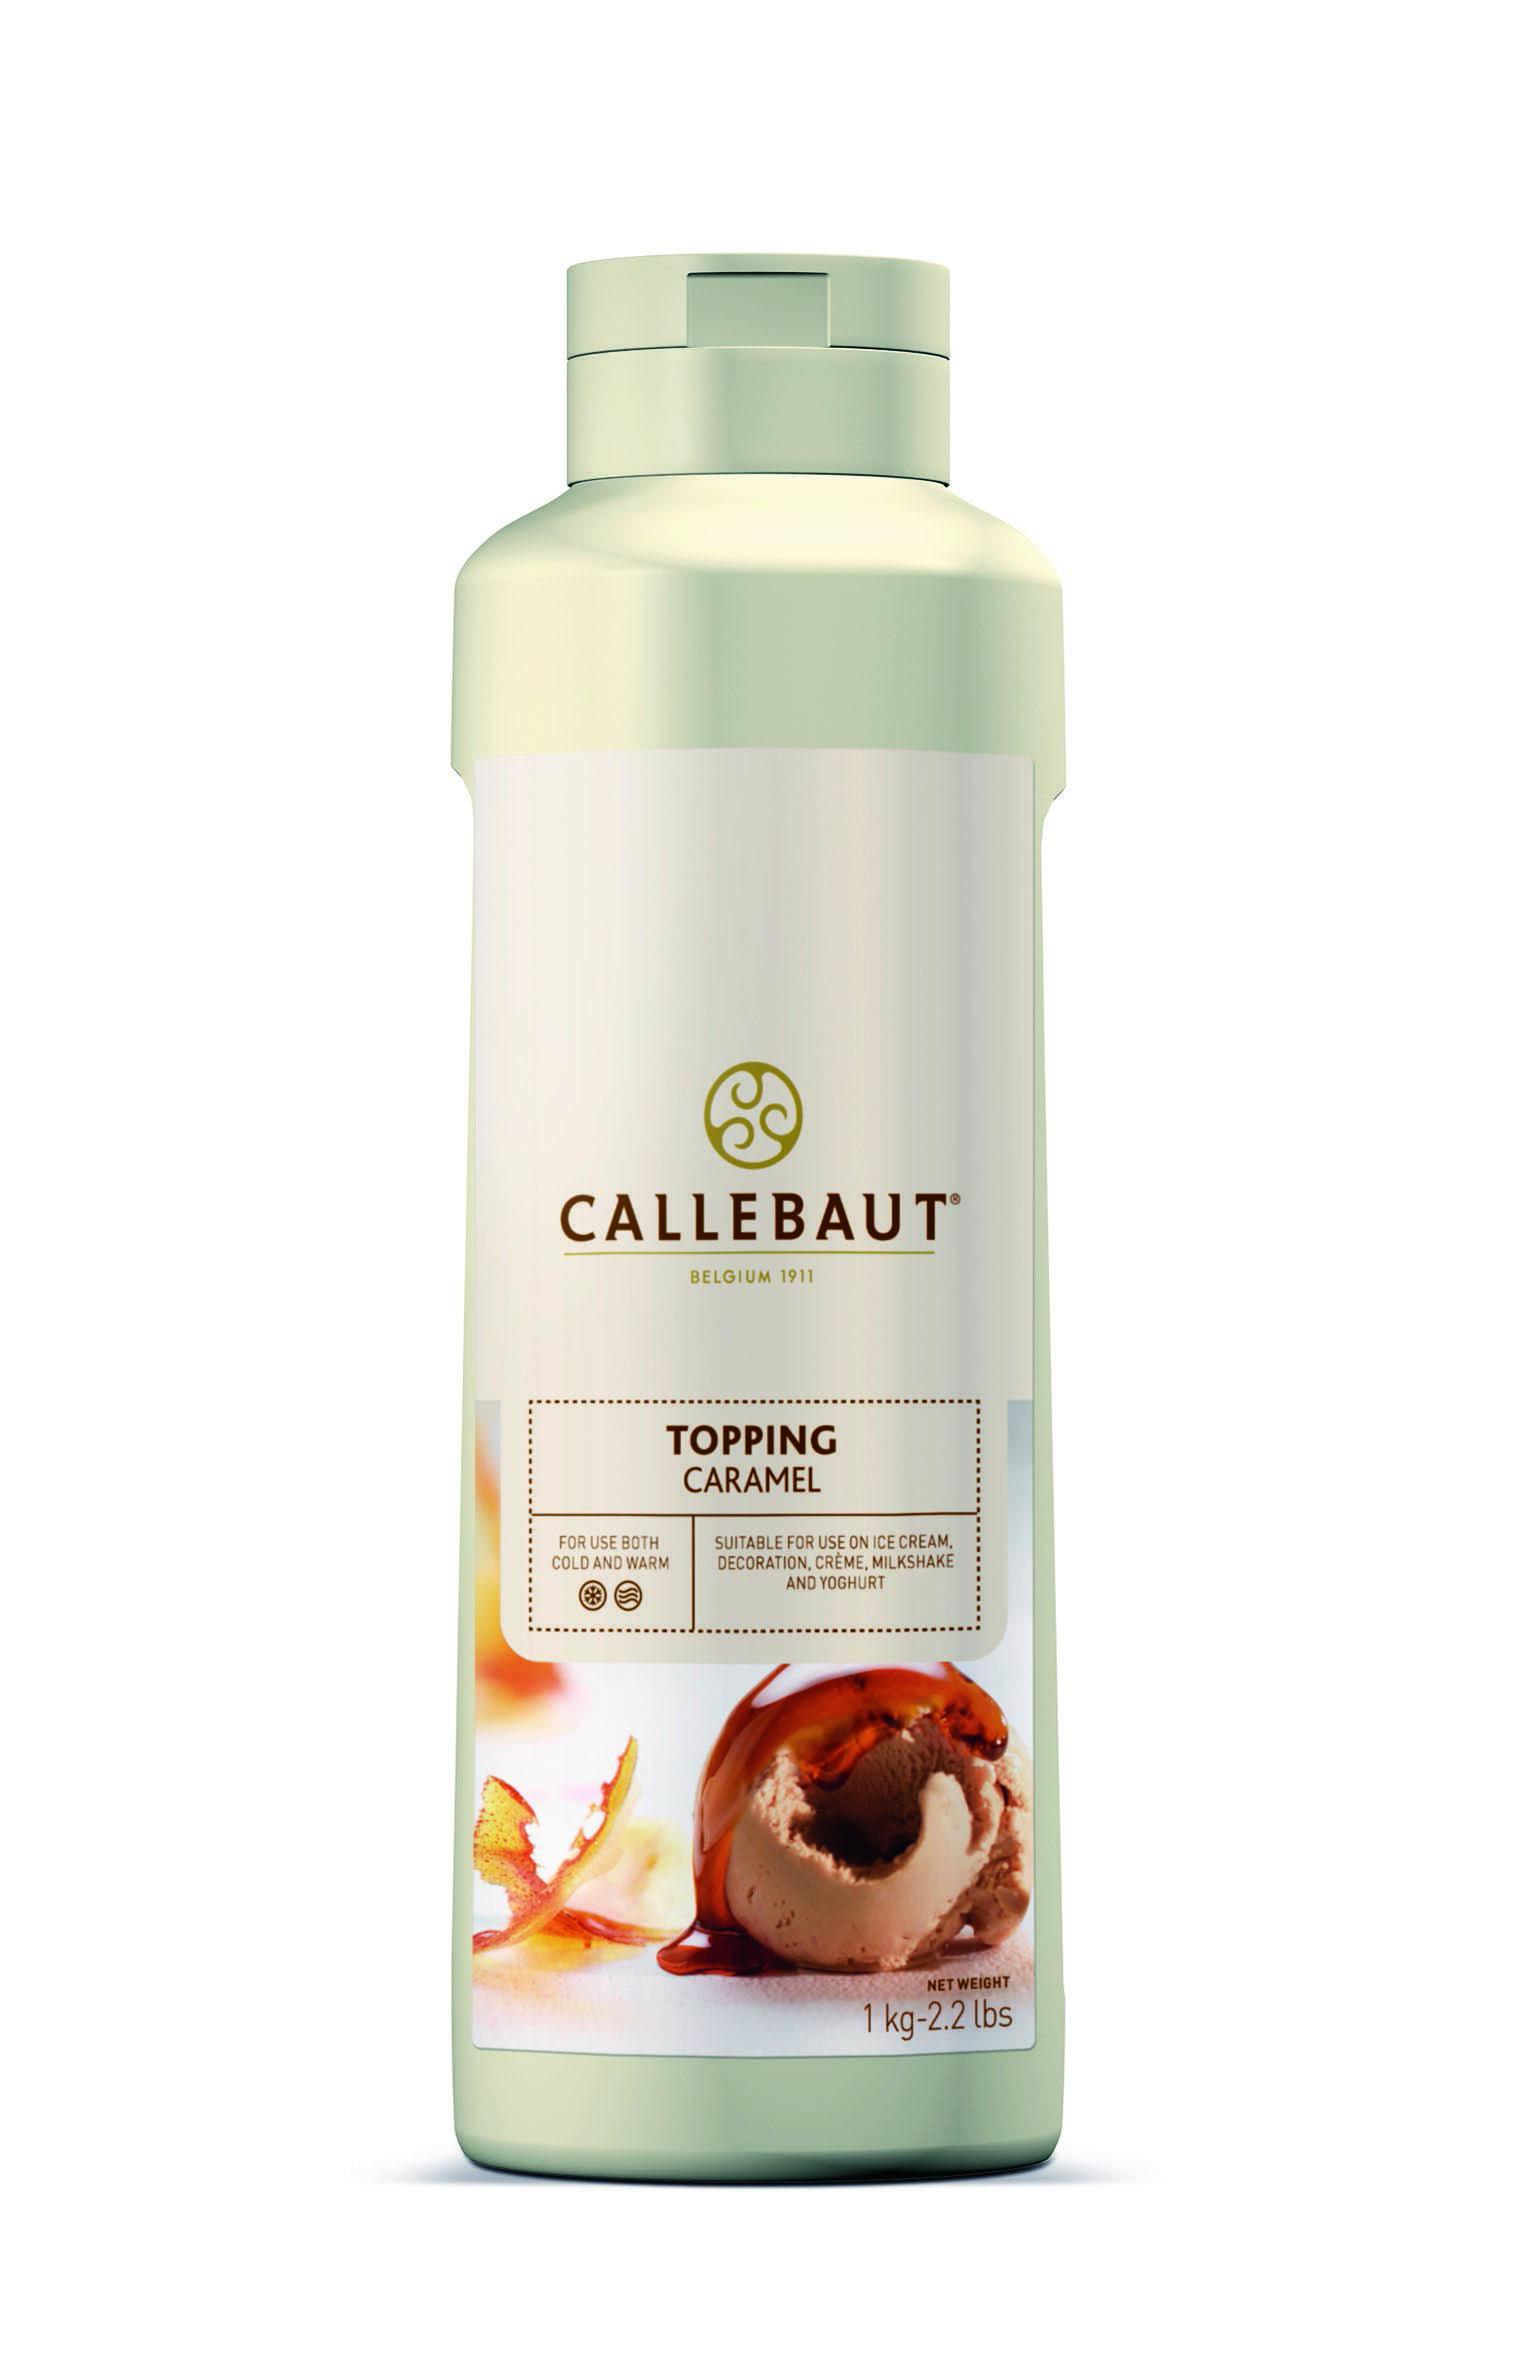 Topping Karamel 1L Callebaut knijpfles